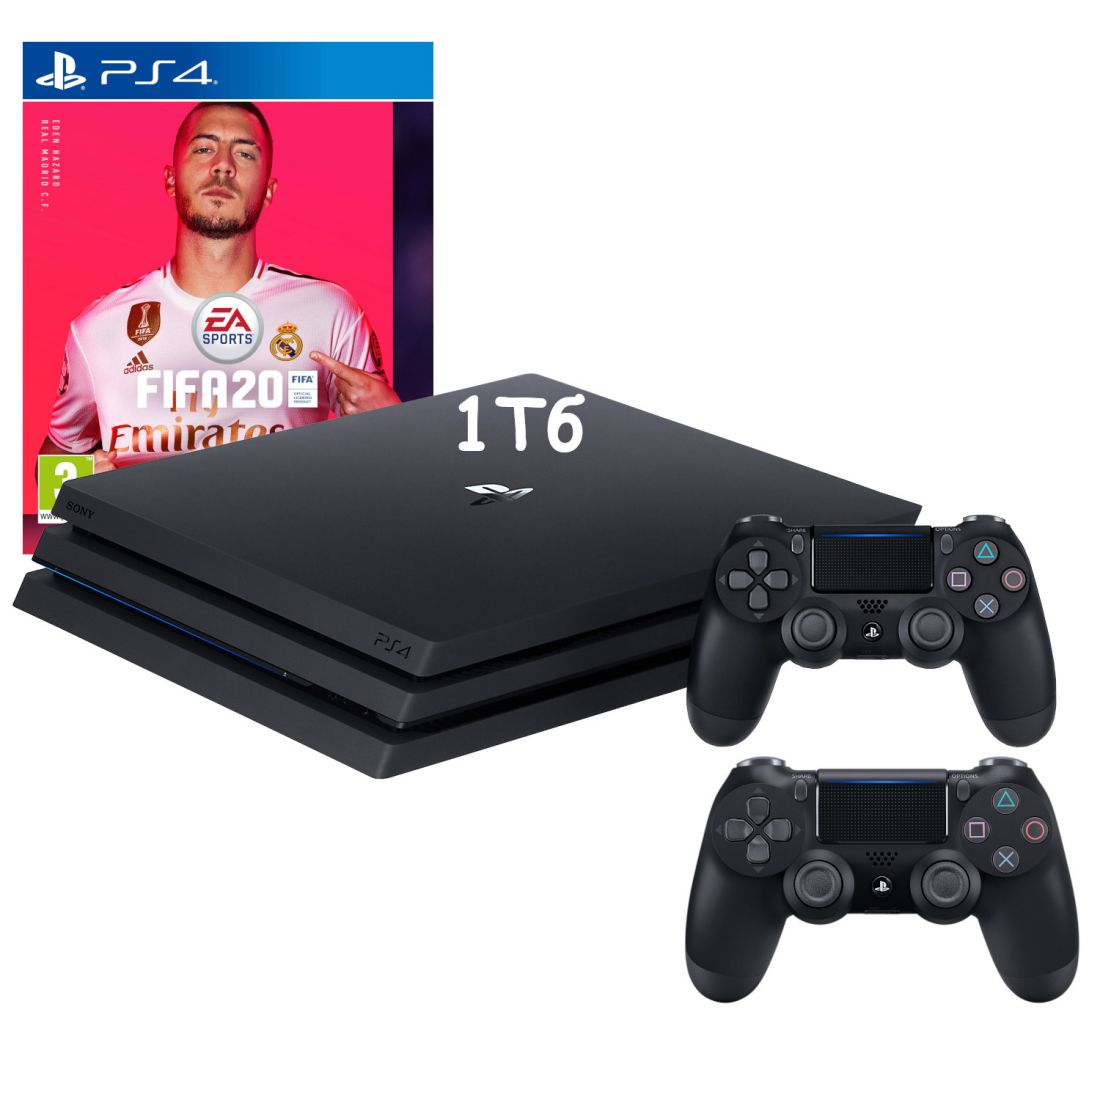 Sony PlayStation 4 Pro 1Tb + 2й джойстик + игра FIFA 20